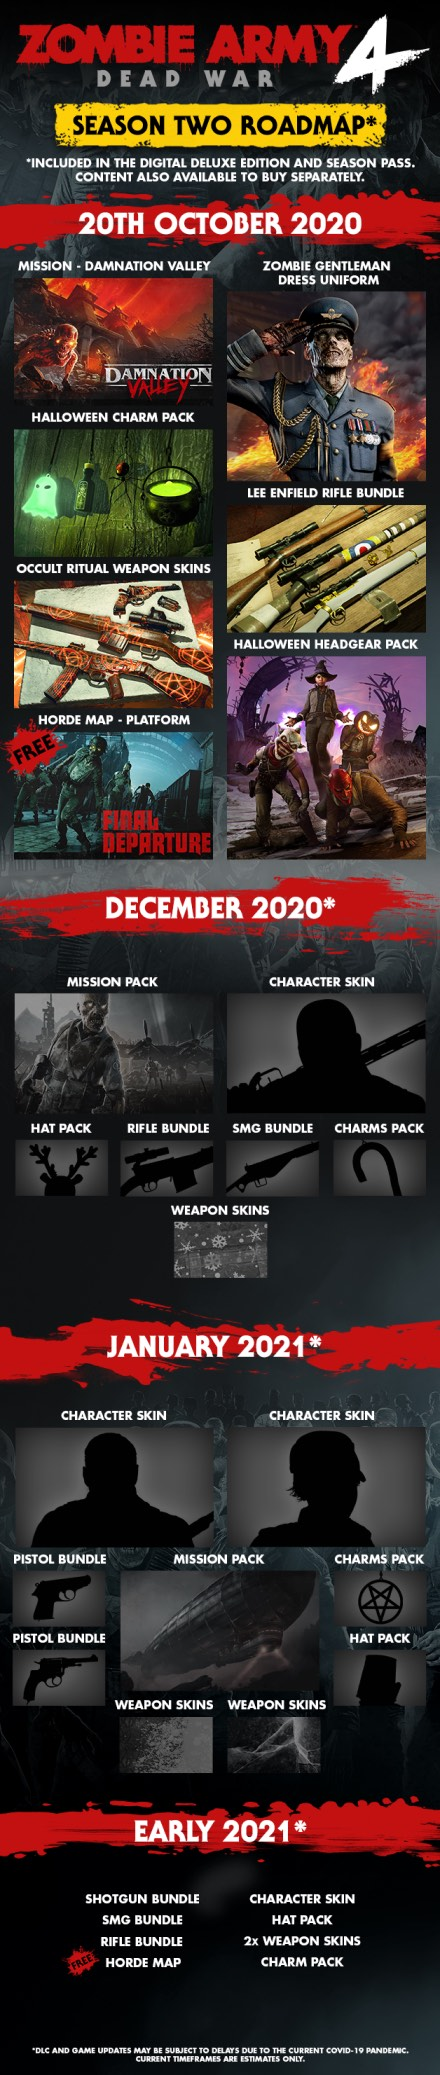 Zombie Army 4 begint aan avontuur in Damnation Valley